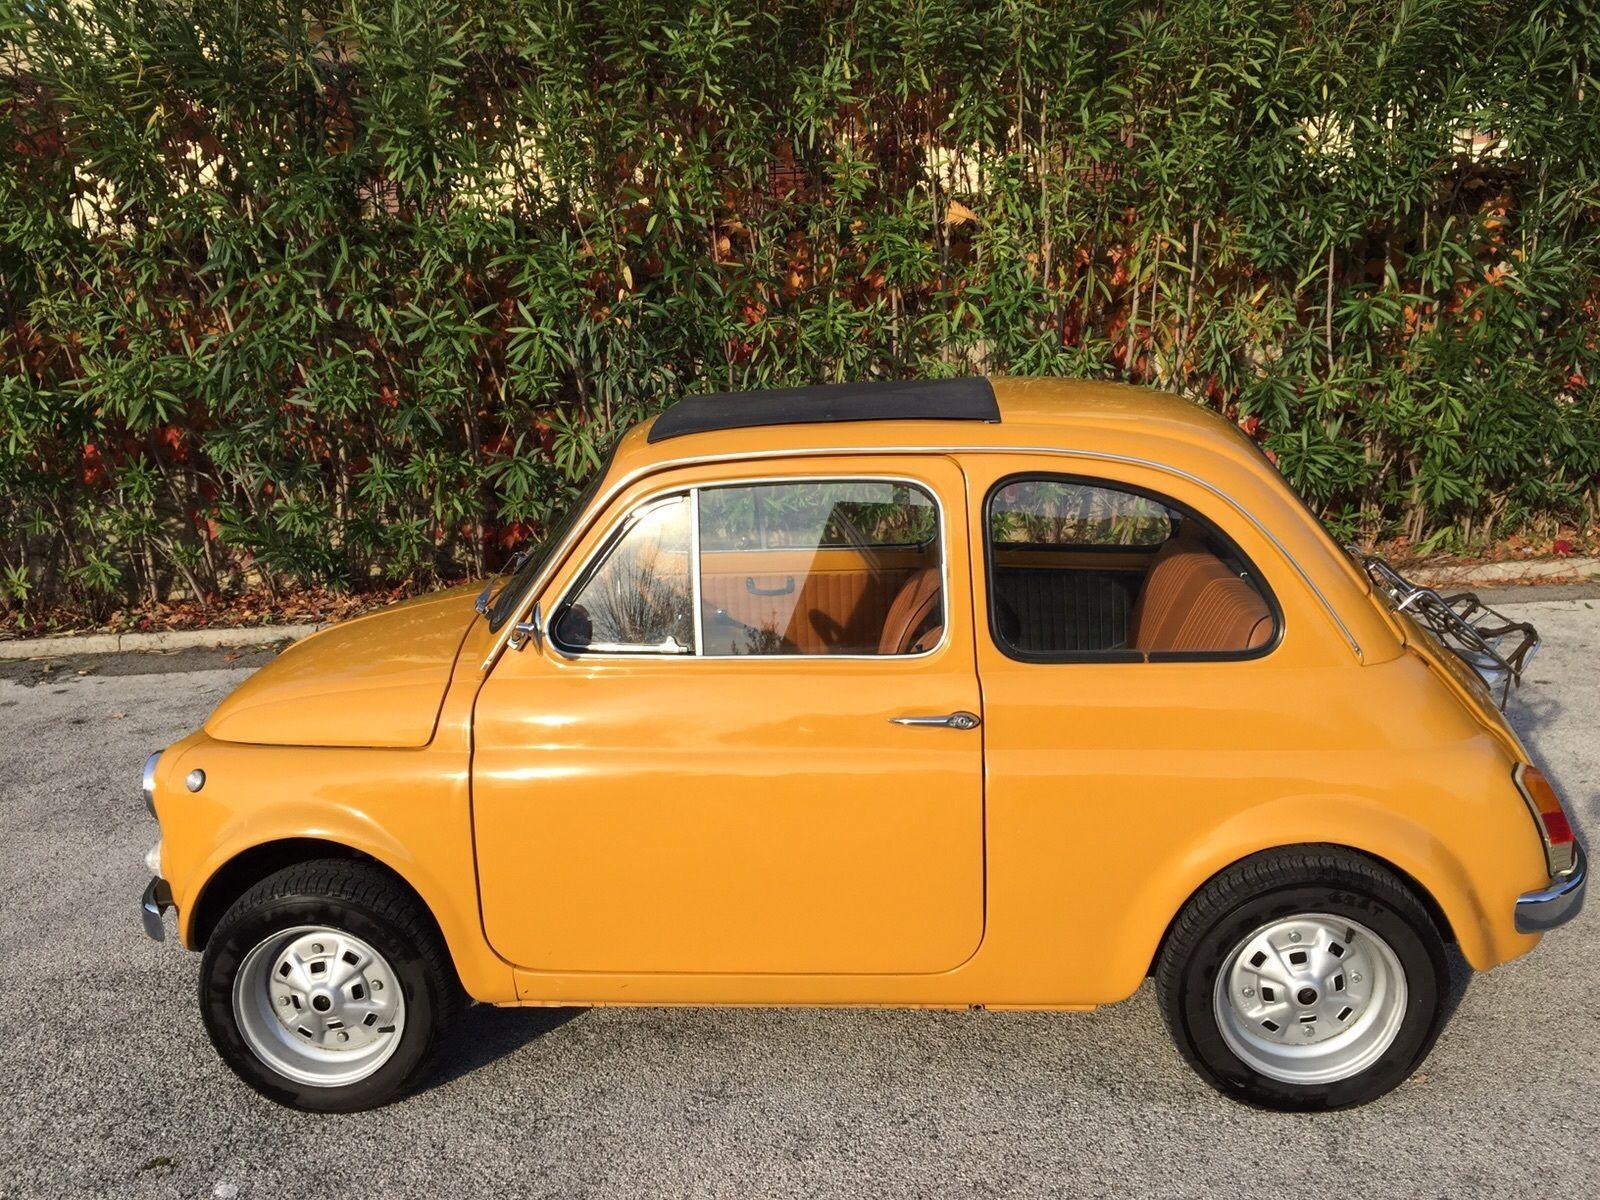 1970 Fiat 500 110f Model L Luxury Yellow Positano For Sale